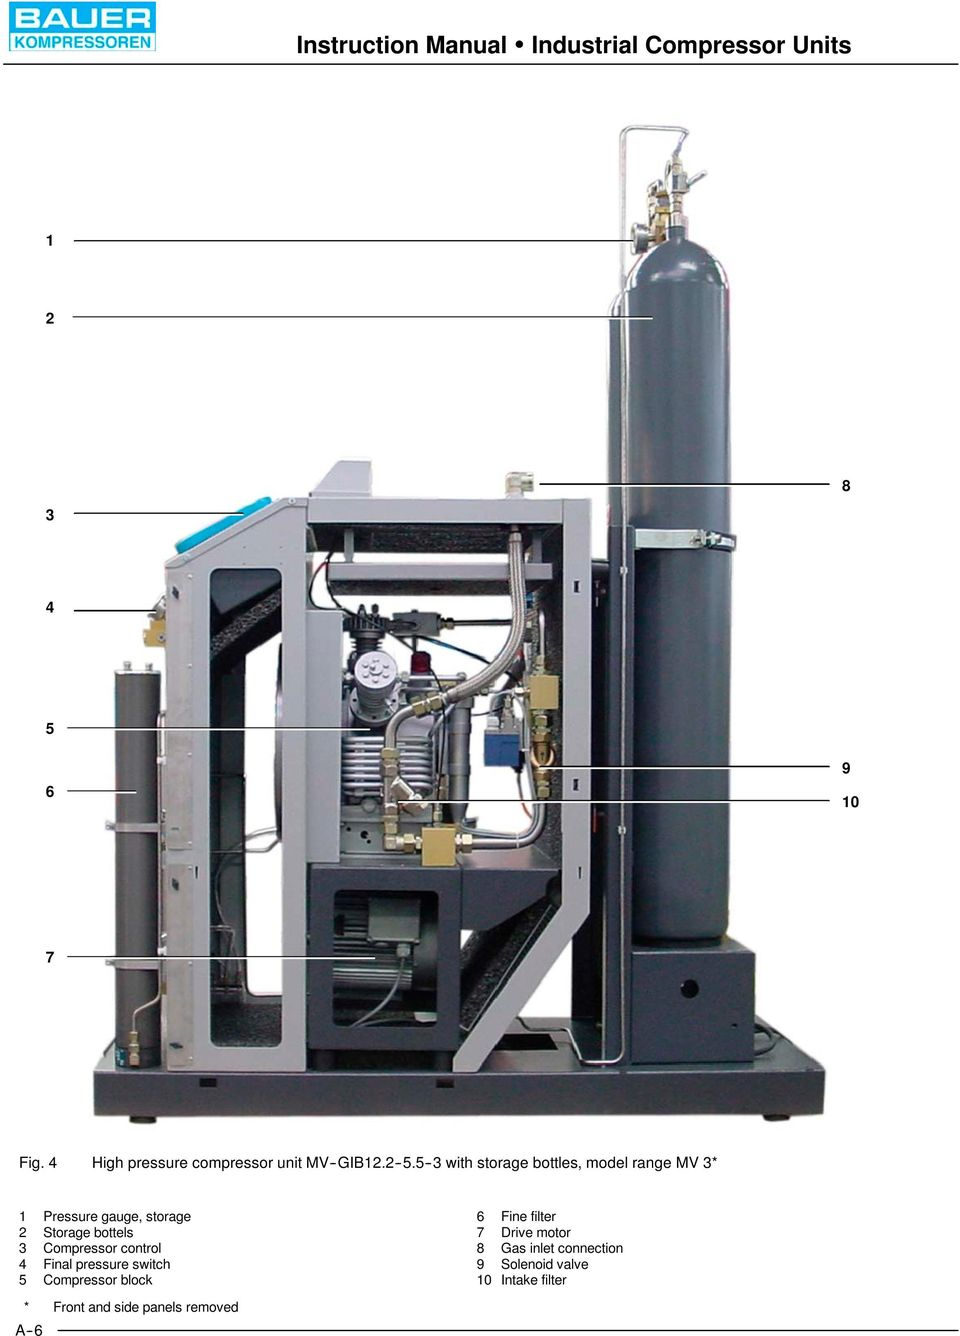 medium resolution of bottels 3 compressor control 4 final pressure switch 5 compressor block 6 fine filter